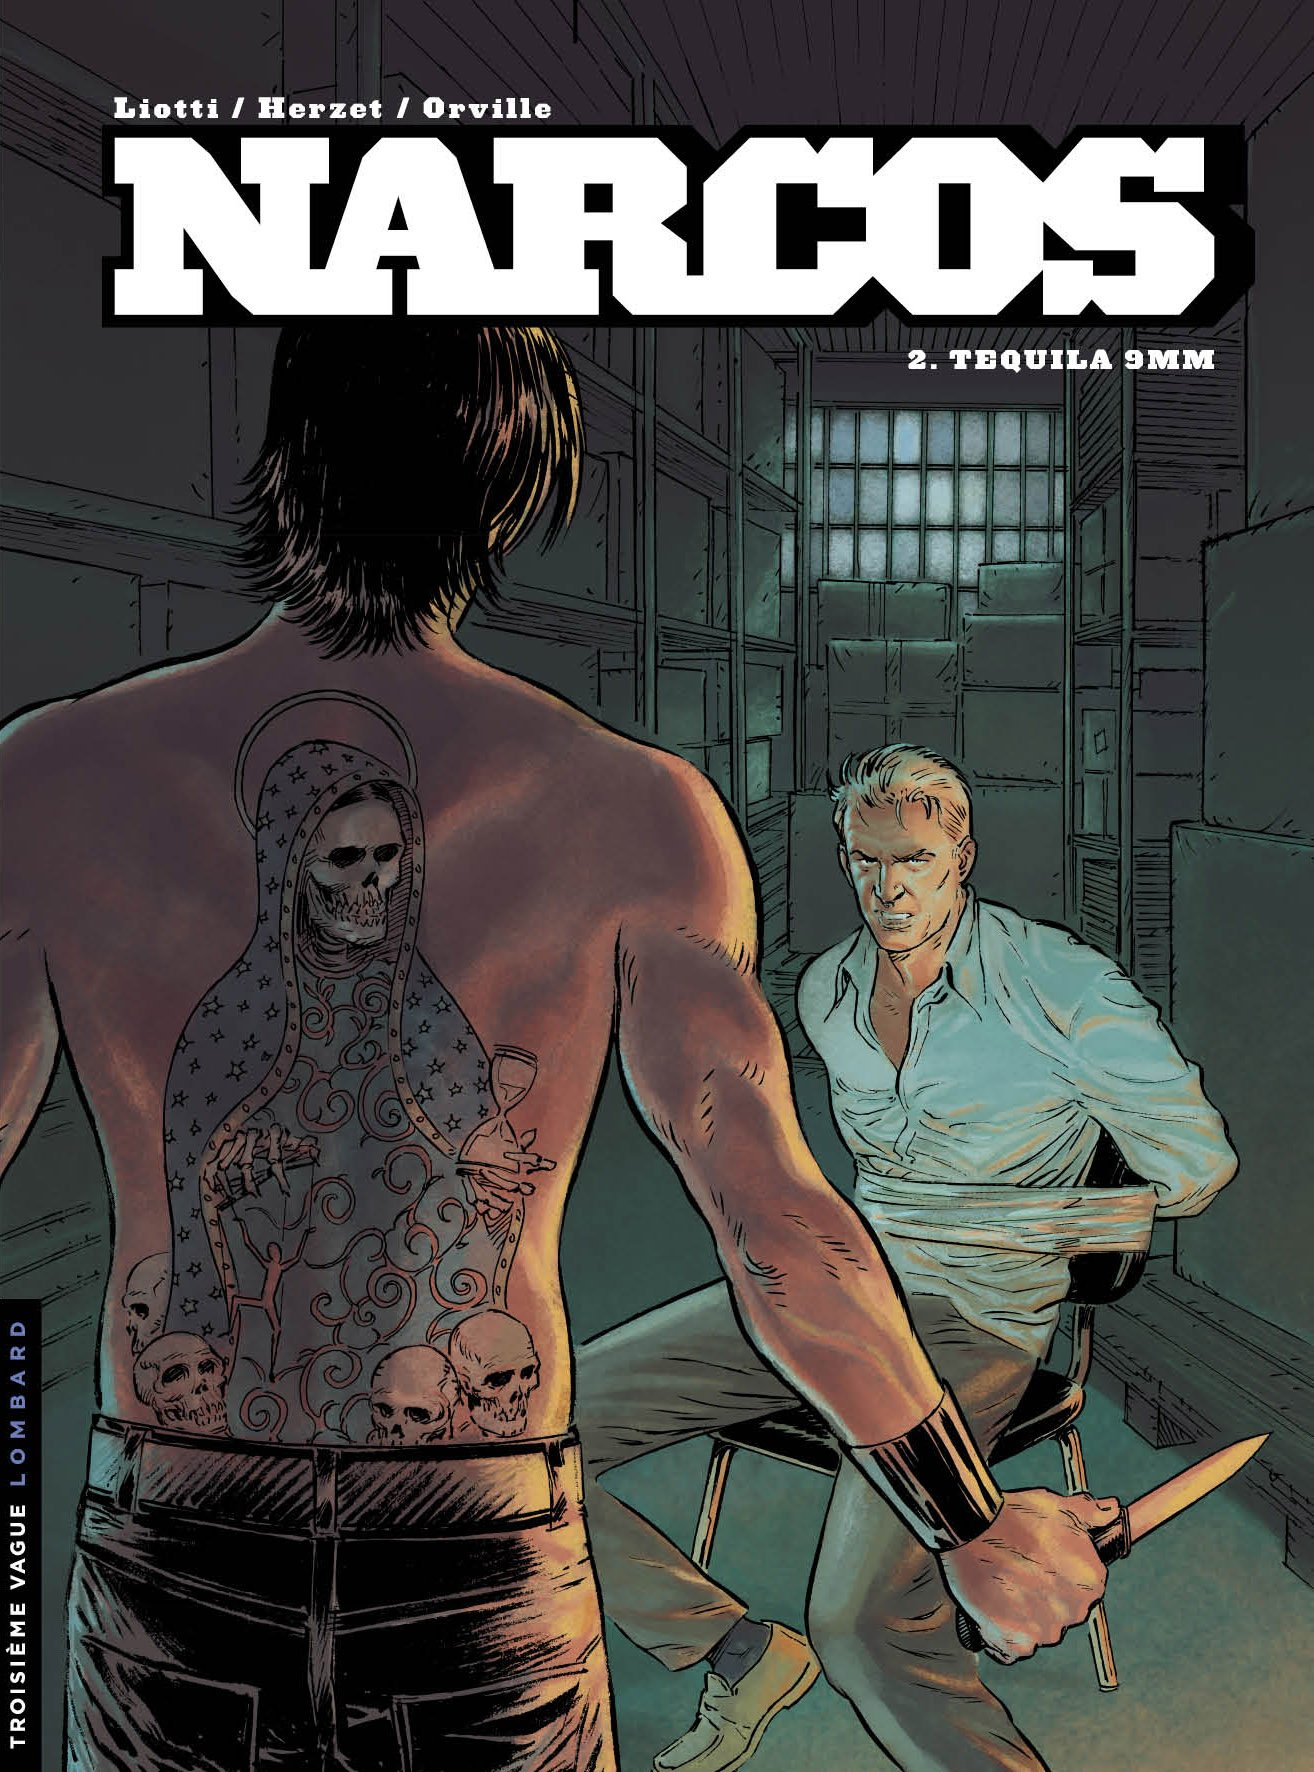 Narcos - tome 2 - Tequila 9 mm Album – 27 octobre 2011 Herzet Orville Liotti Giuseppe Le Lombard